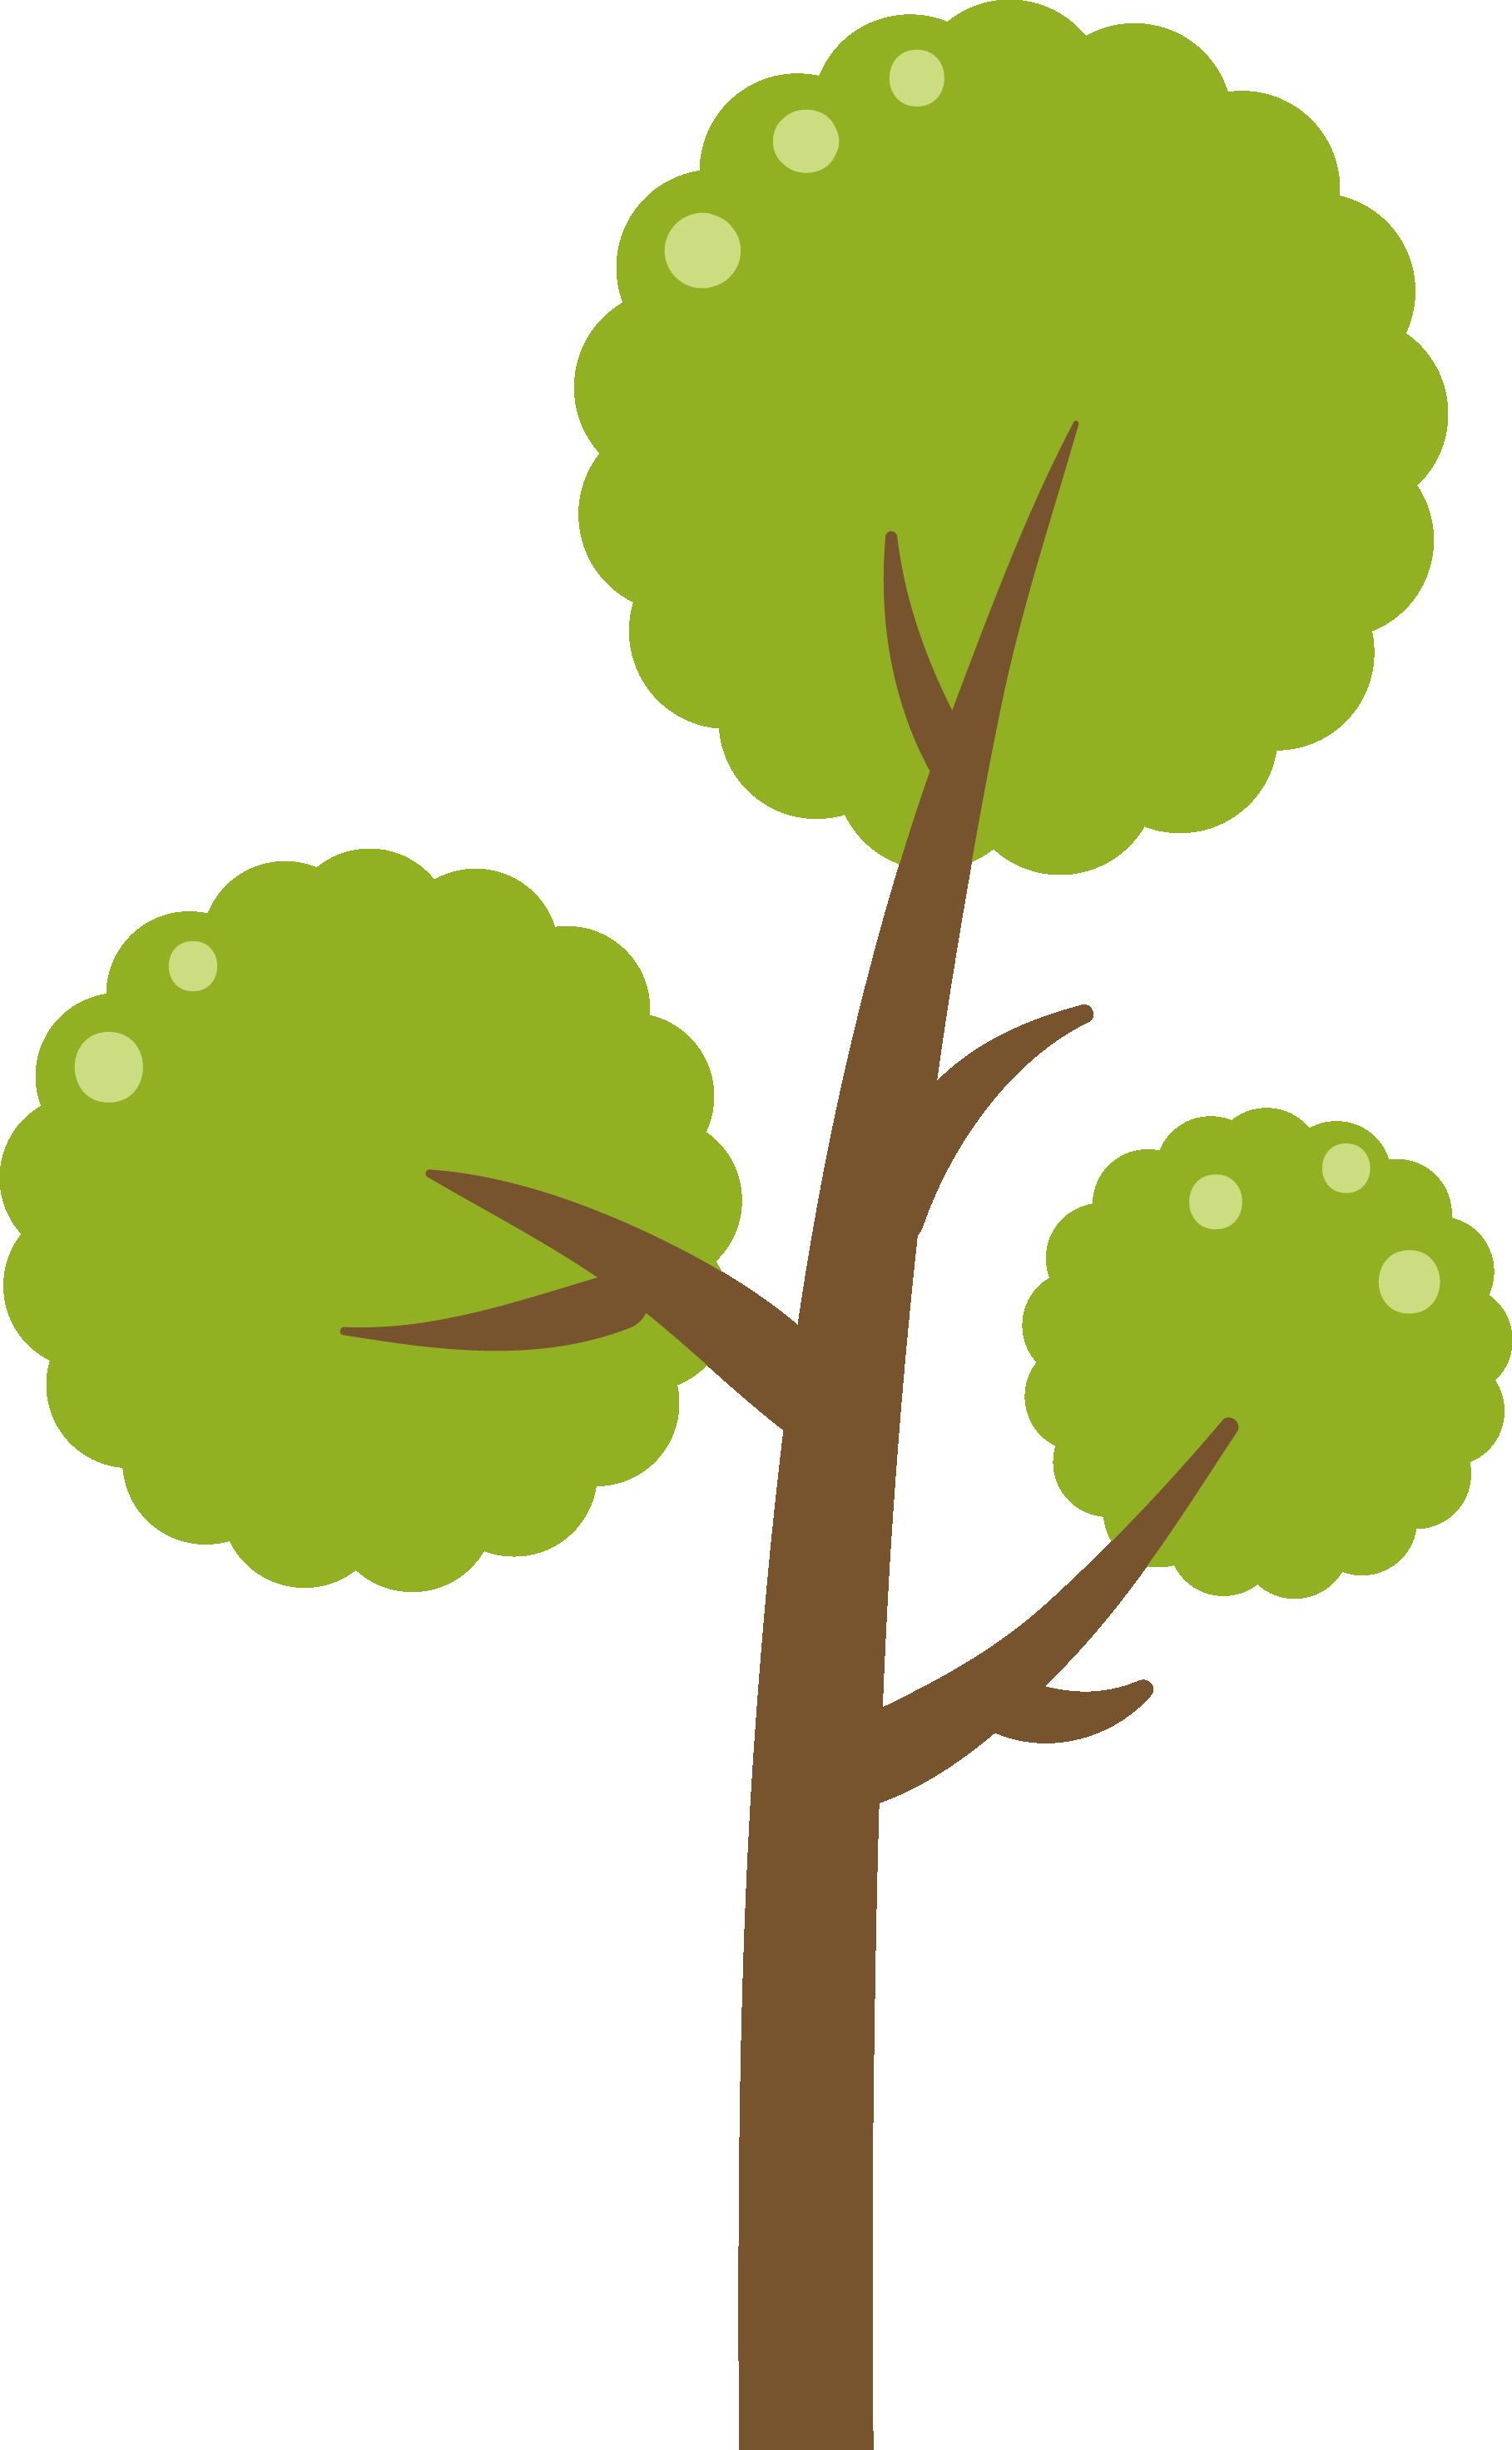 Tree sapling clipart jpg freeuse stock Green tree vector diagram 1817*2944 transprent Png Free Download ... jpg freeuse stock